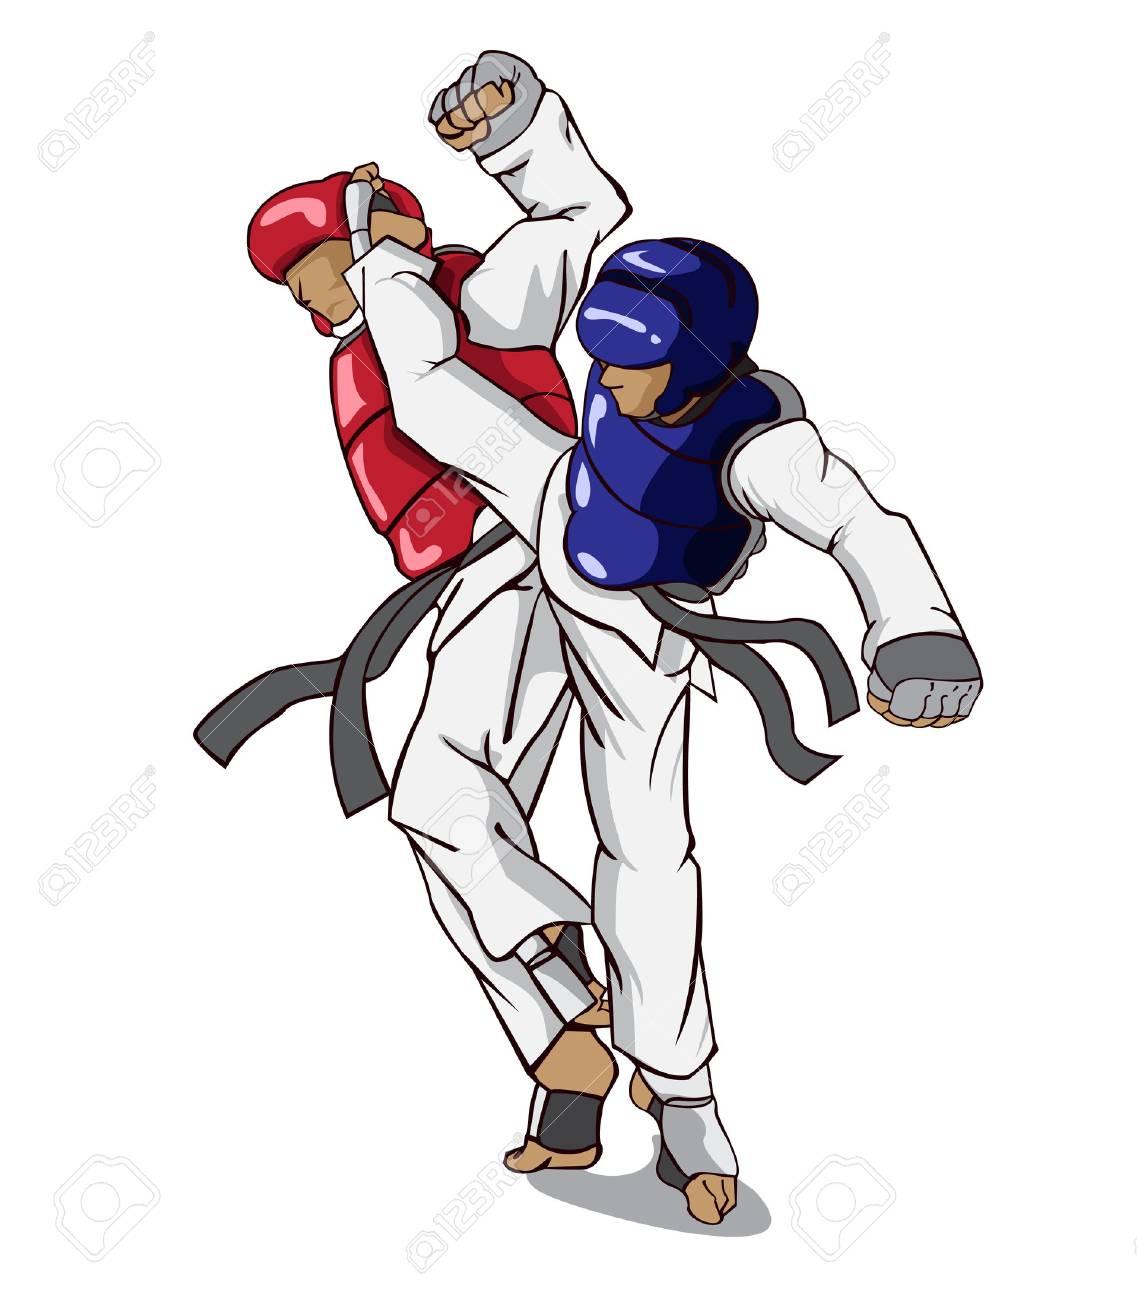 Taekwondo Martial Art Royalty Free Cliparts Vectors And Stock Illustration Image 47708538